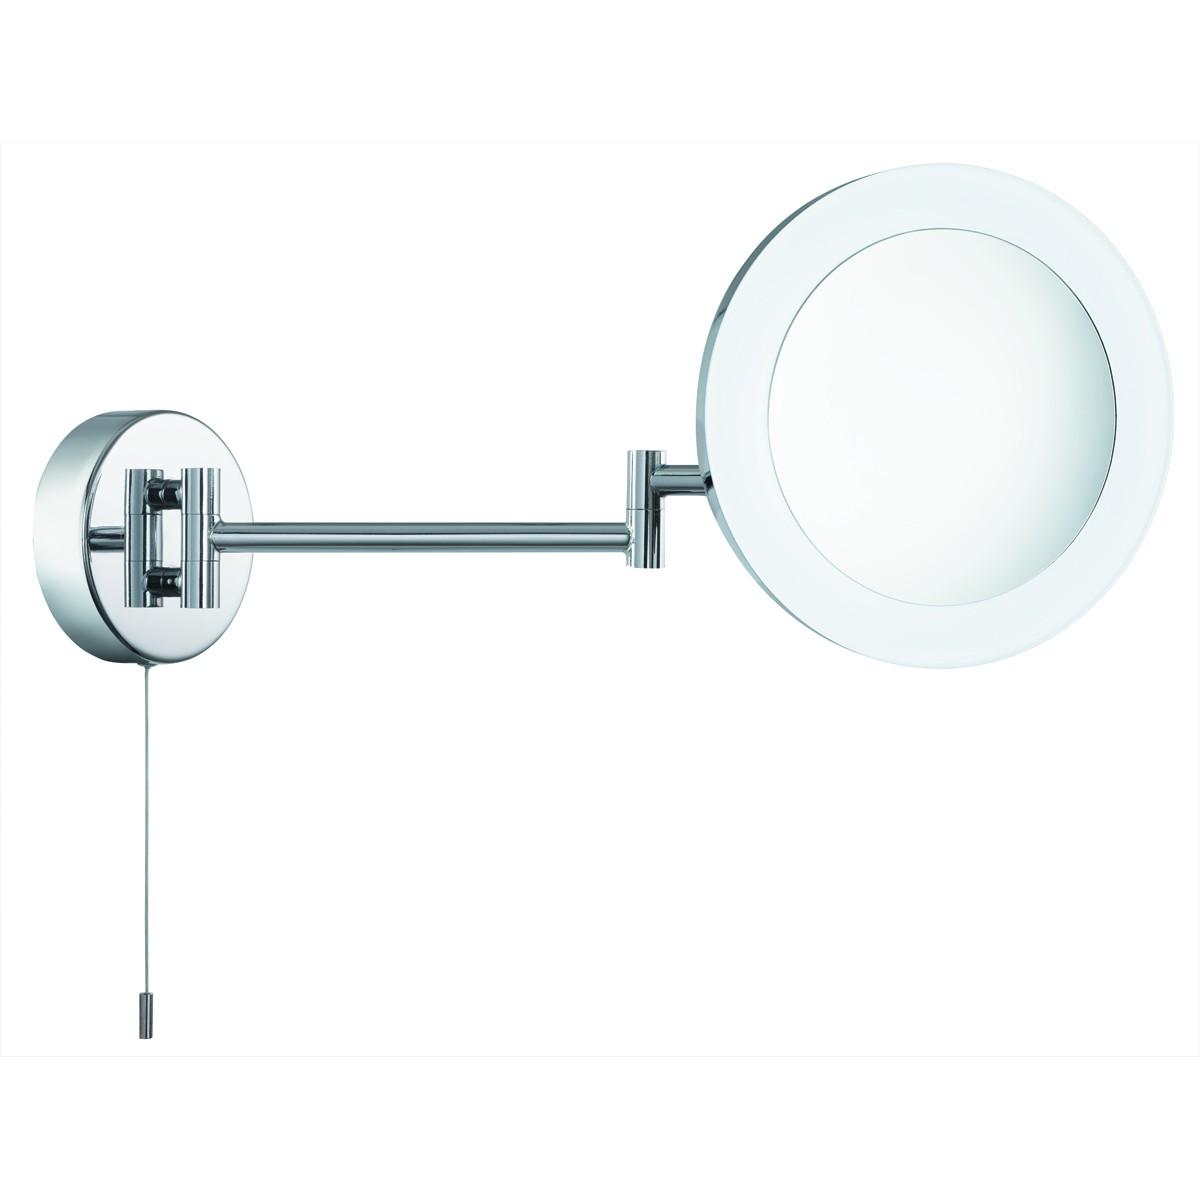 led badezimmer spiegel kosmetikspiegel beleuchtet schwenkbar chrom ip44. Black Bedroom Furniture Sets. Home Design Ideas